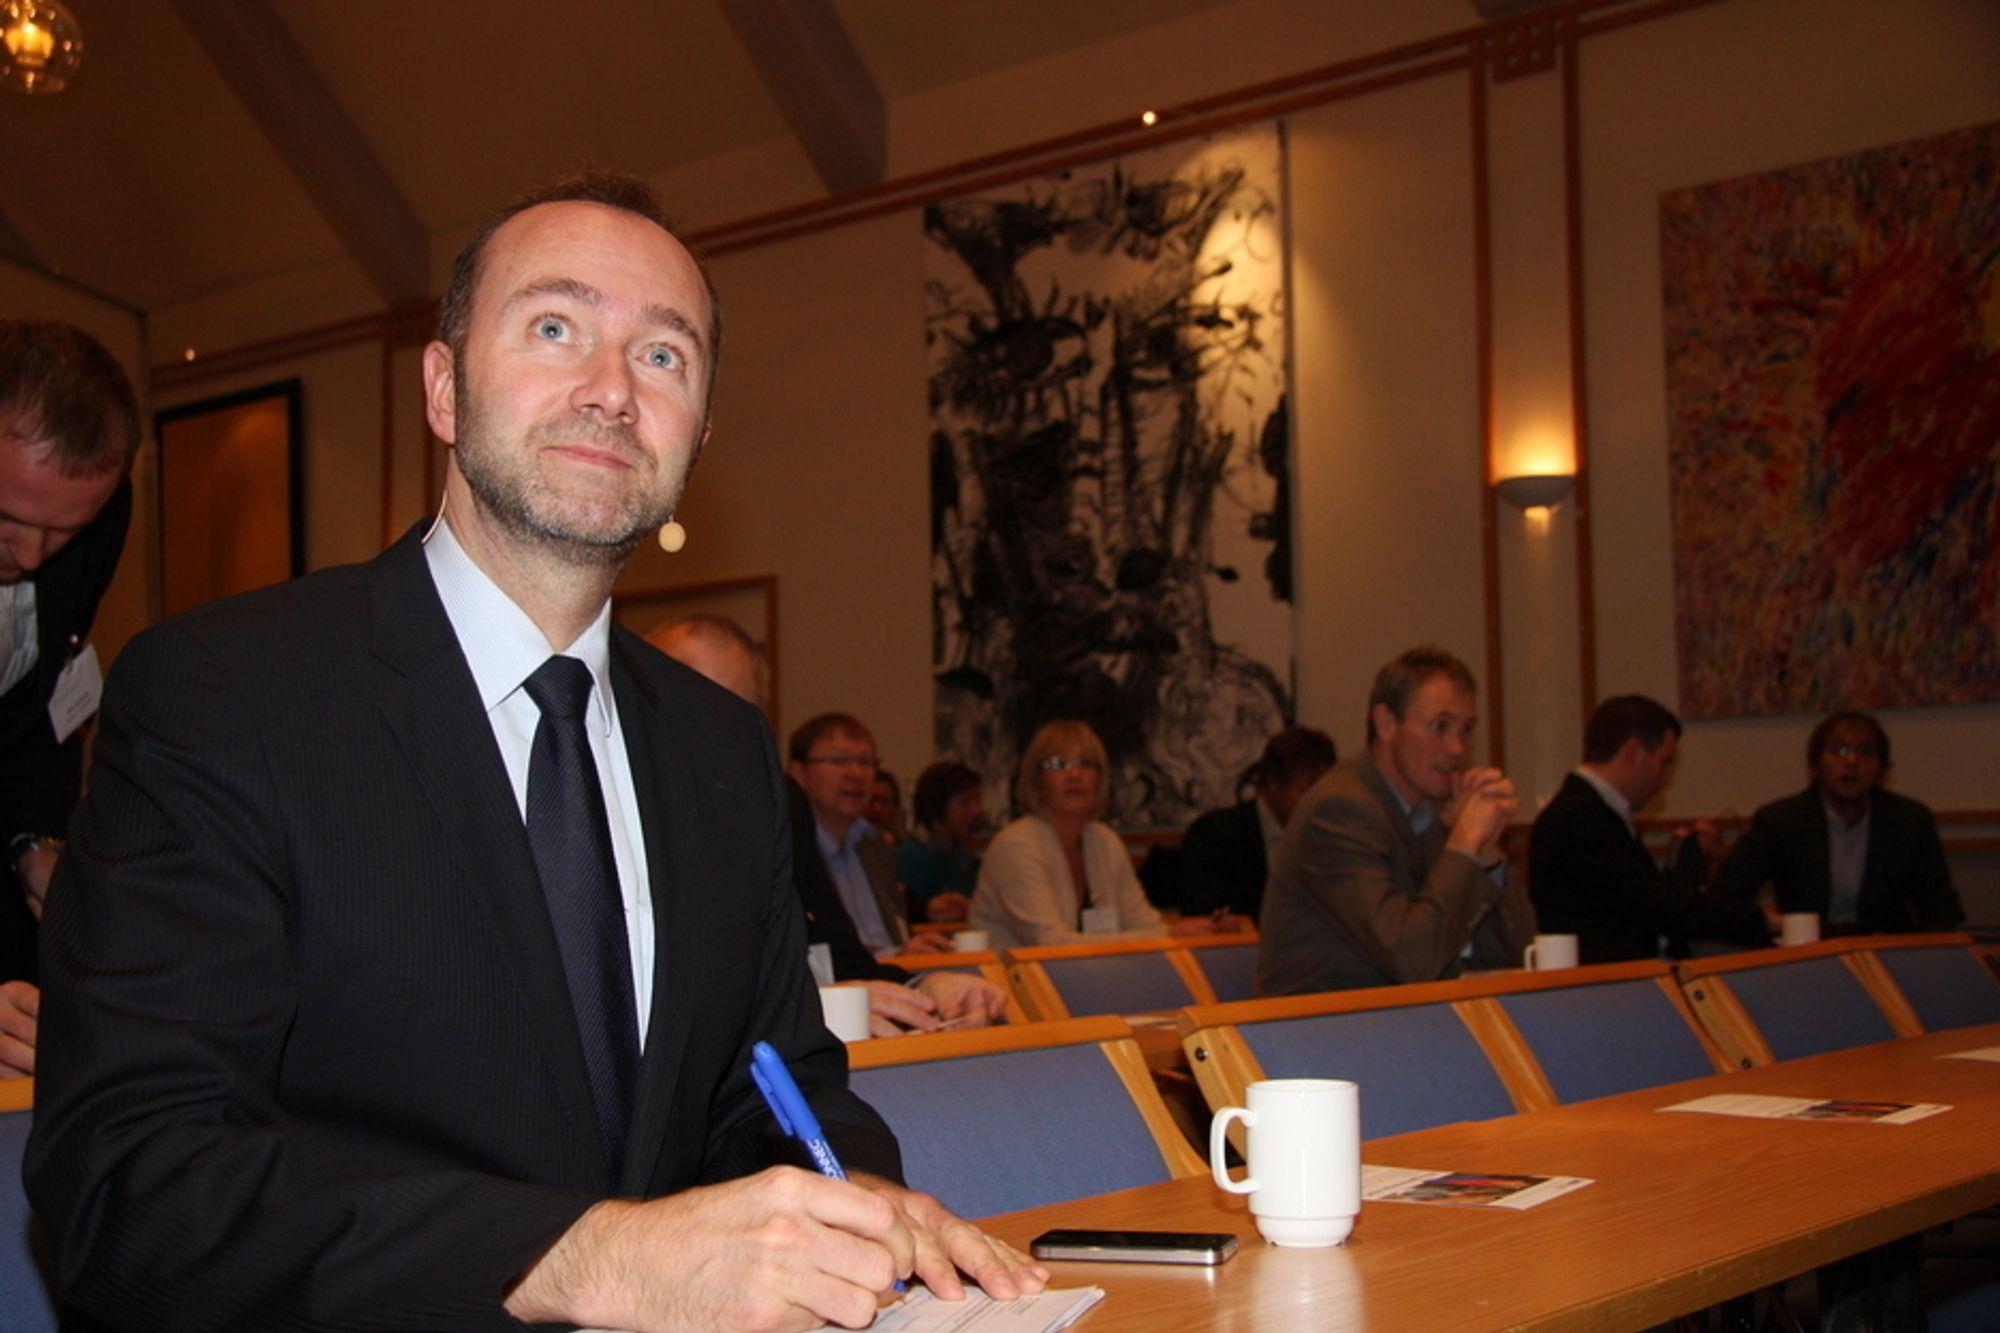 Nærings- og handelsminister Trond Giske reagerer på få norske kontrakter ved Goliat-utbyggingen.